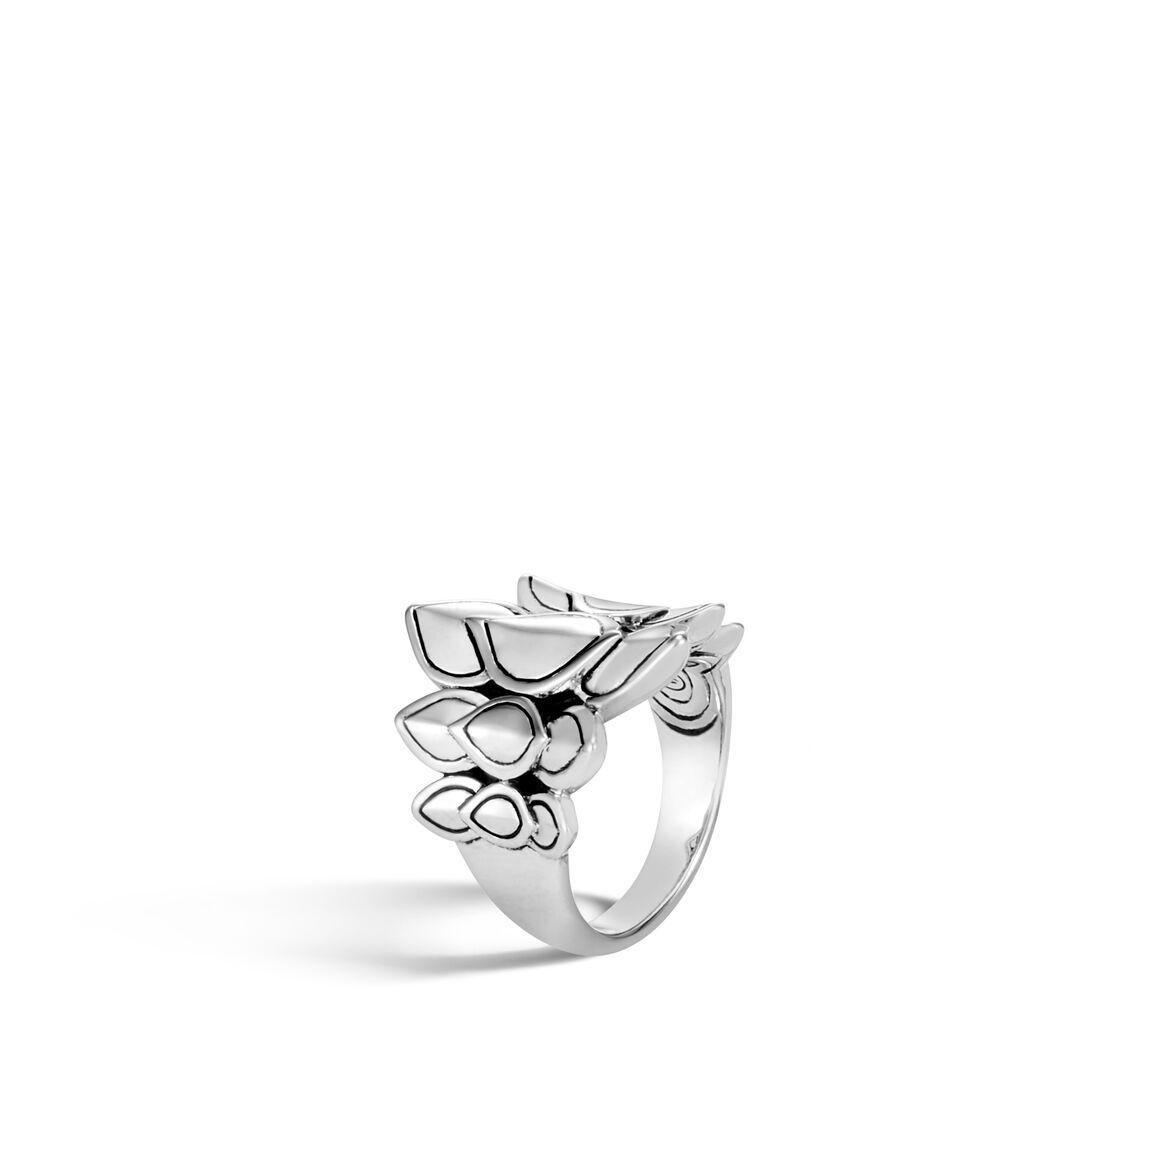 Legends Naga Saddle Ring in Silver